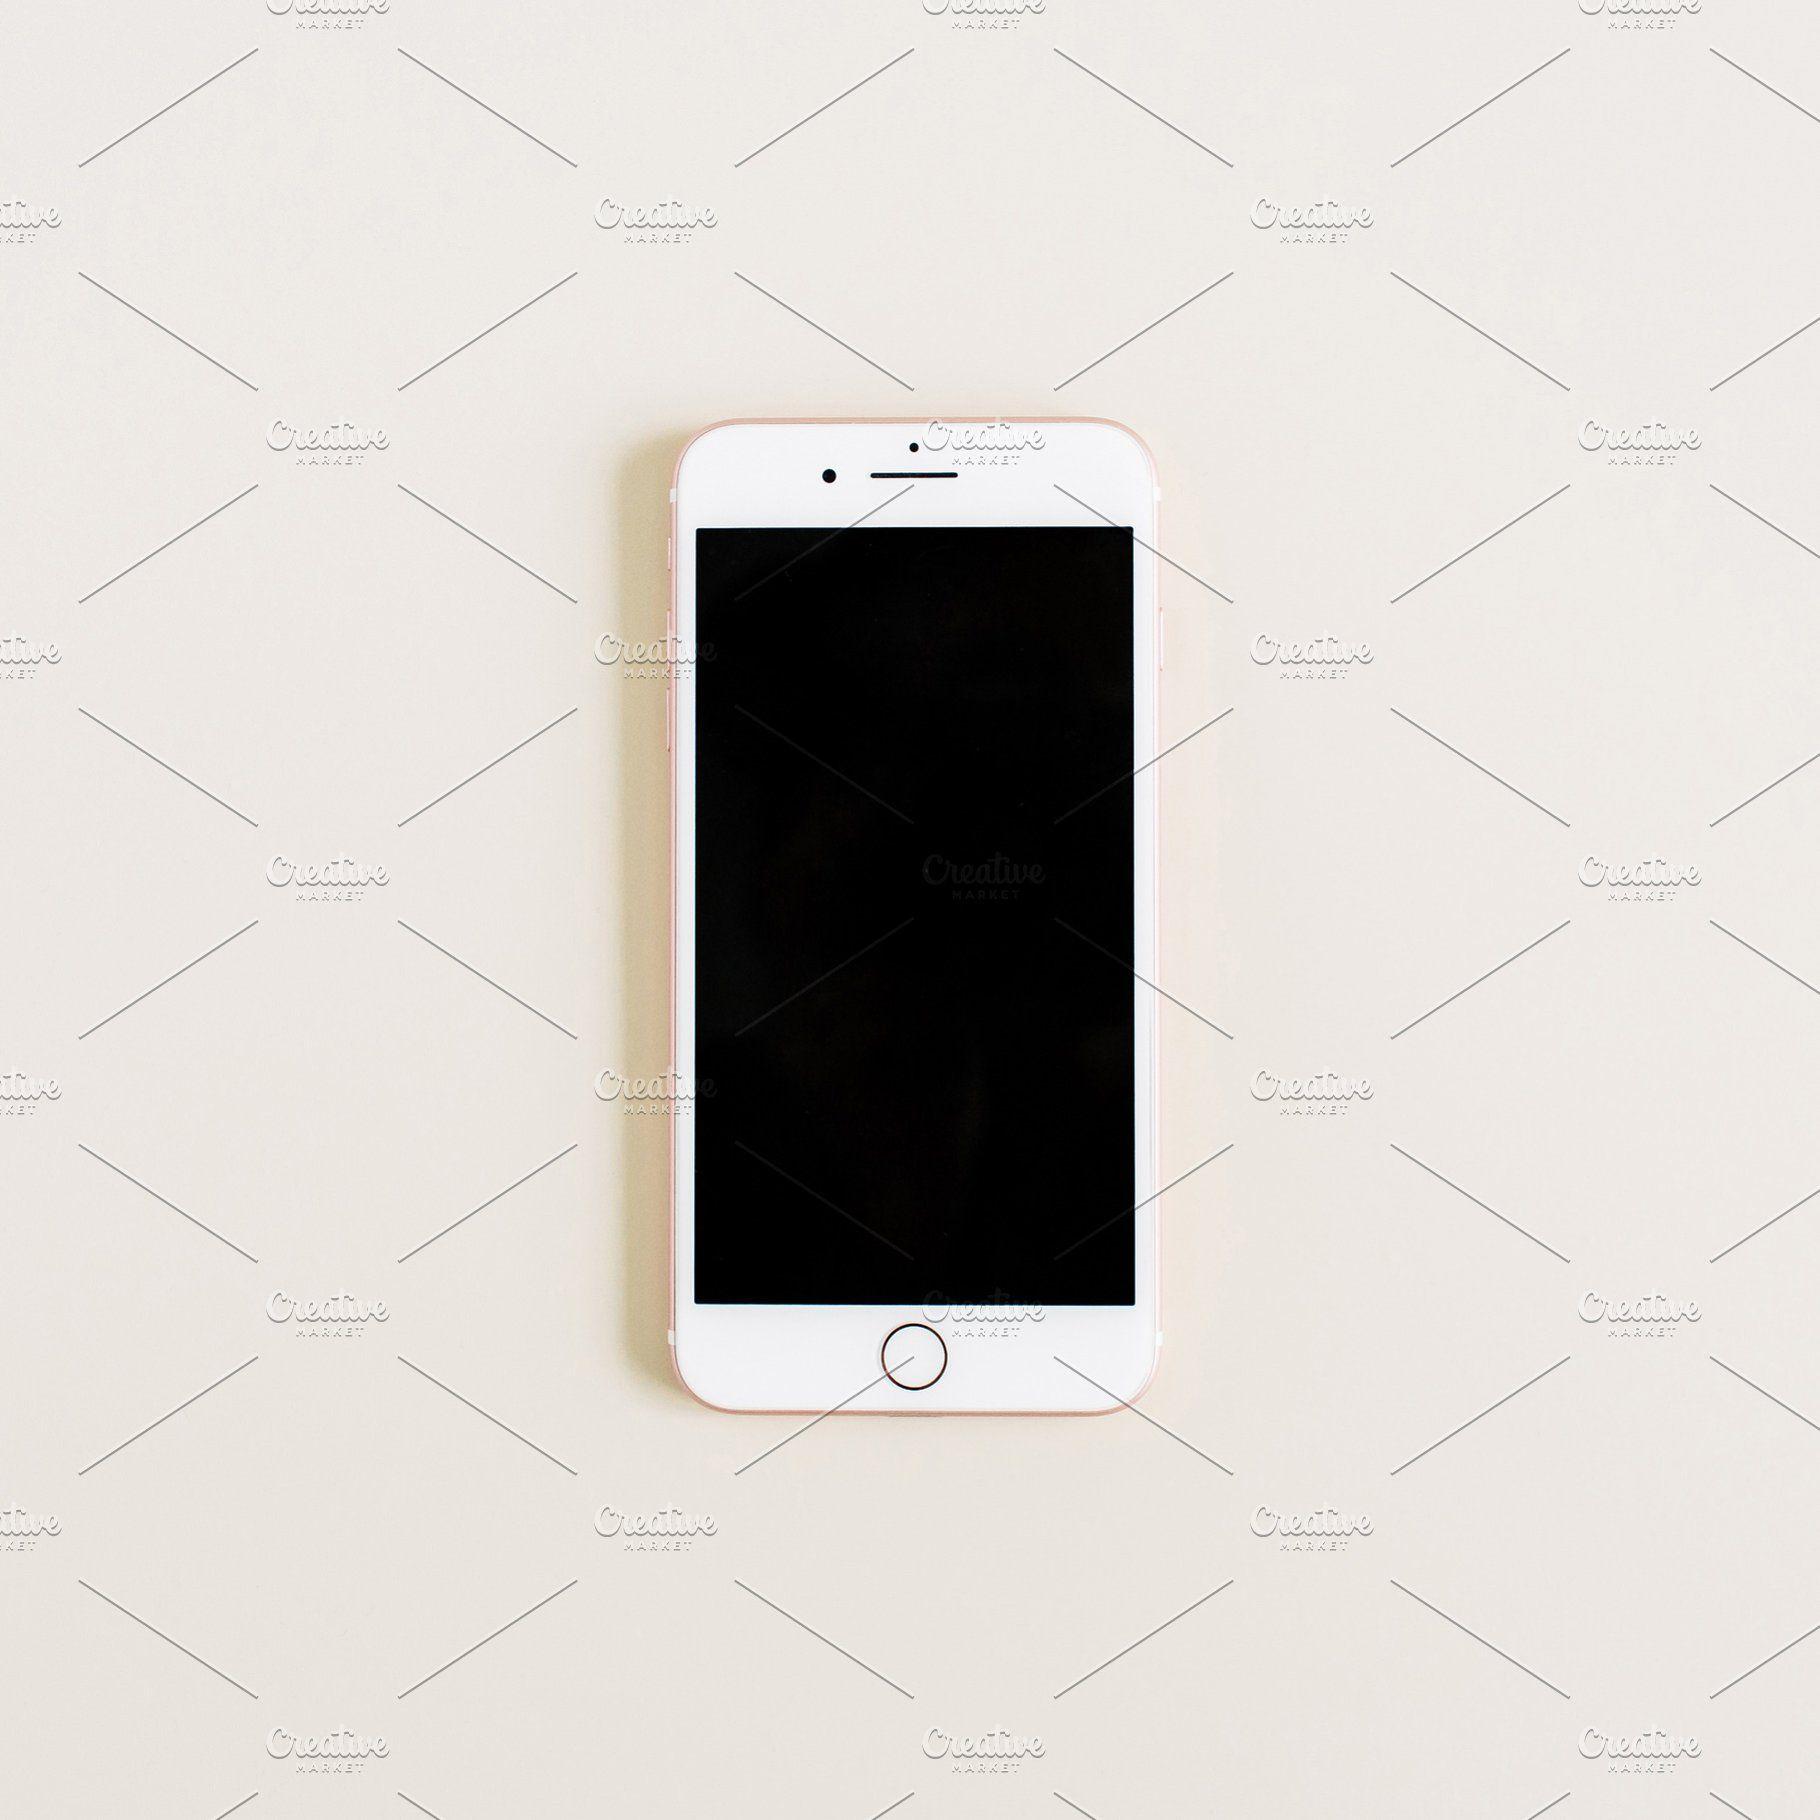 Blank Screen Iphone 8 Plus Iphone Iphone 8 Plus Iphone 8